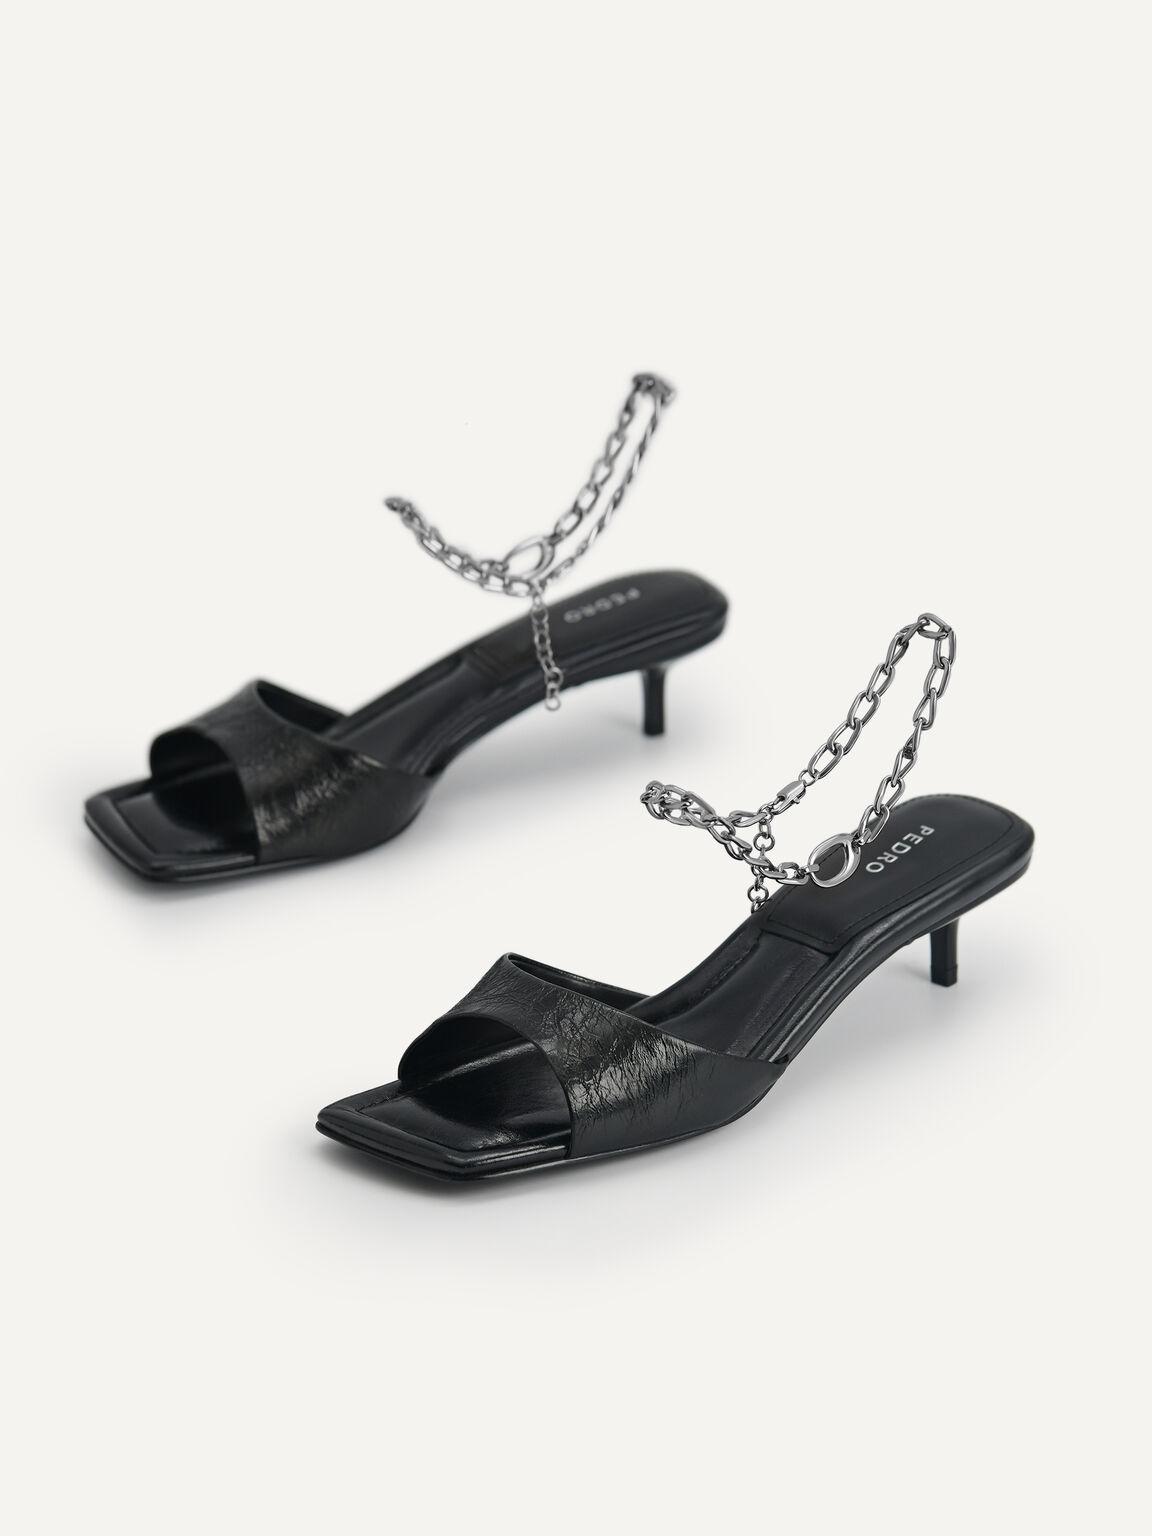 Chain-Strap Leather Heeled Sandals, Black, hi-res